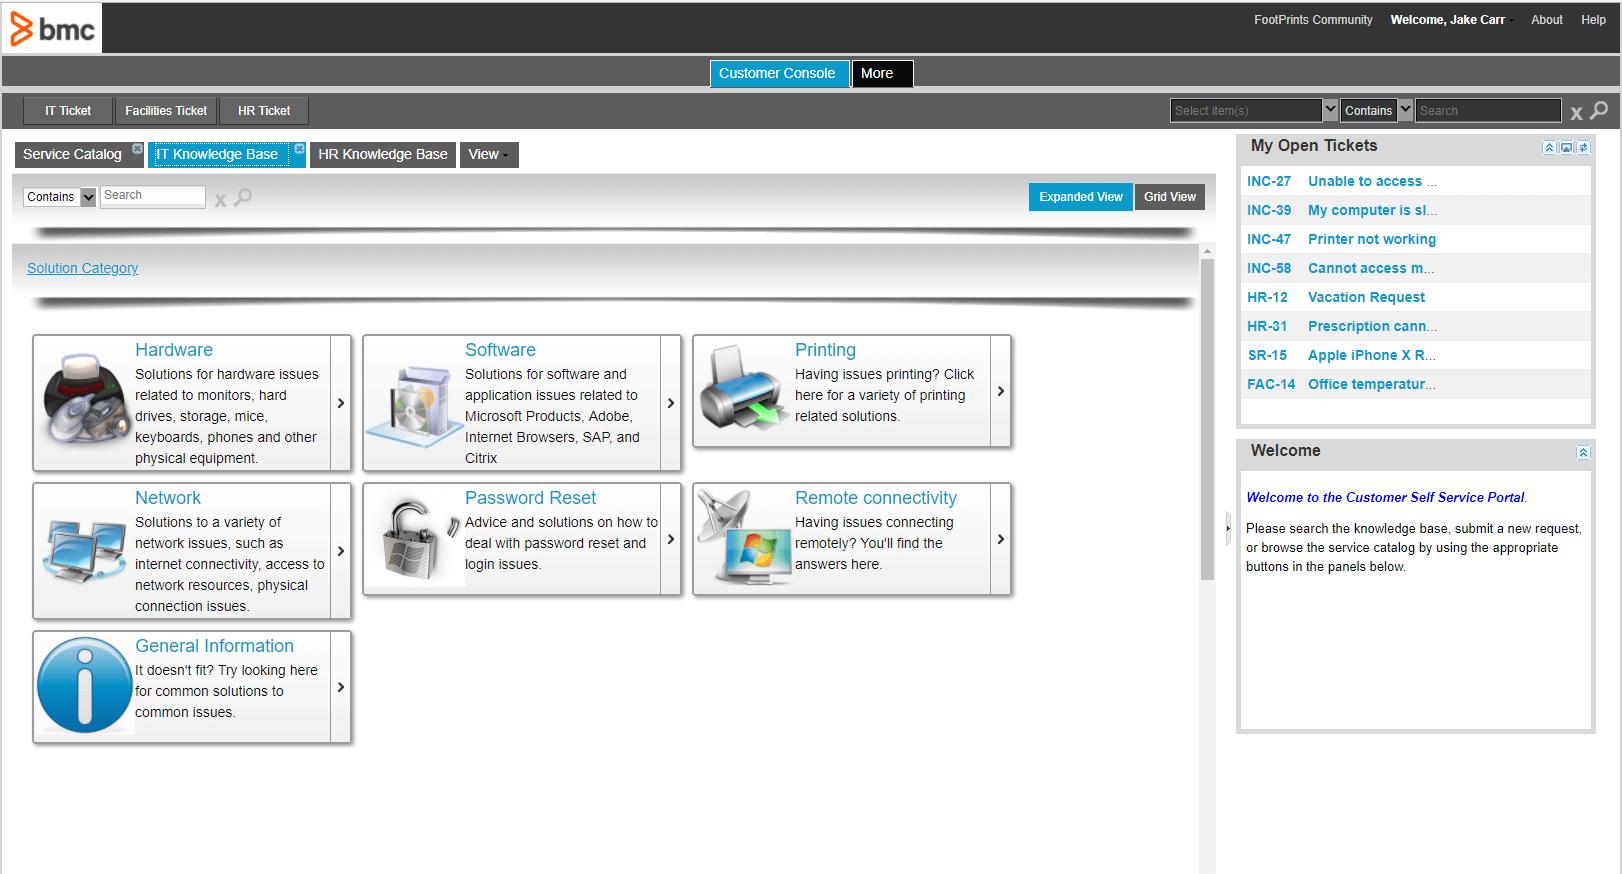 BMC Portal